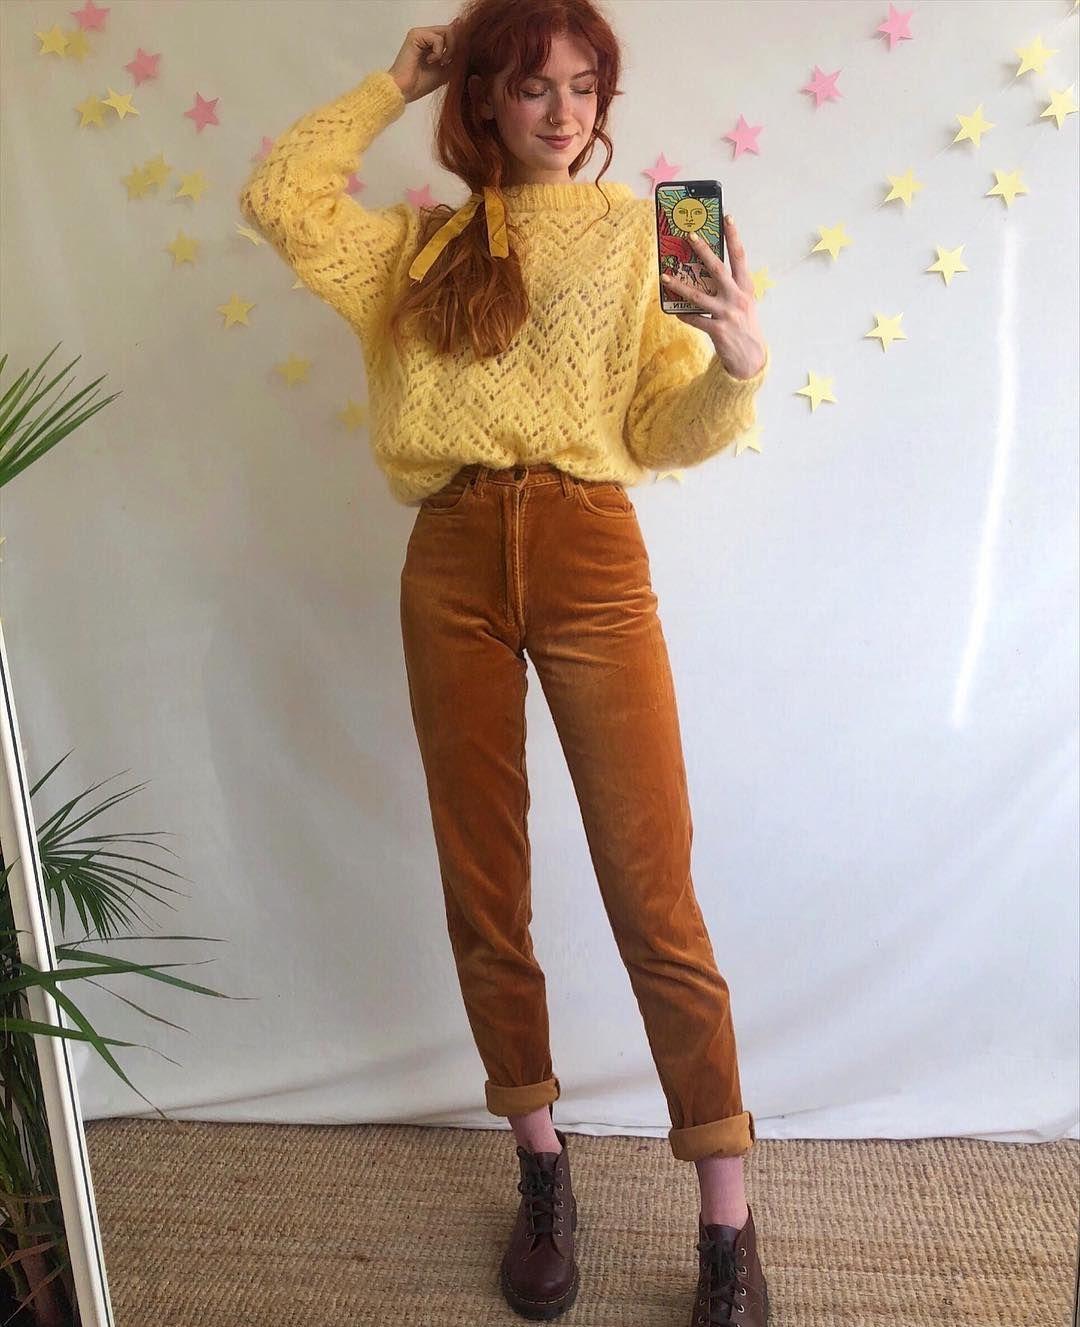 "d5d9f26a mathilda.mai on Instagram: ""Sunshiney studio 🌞"" | outfit ..."